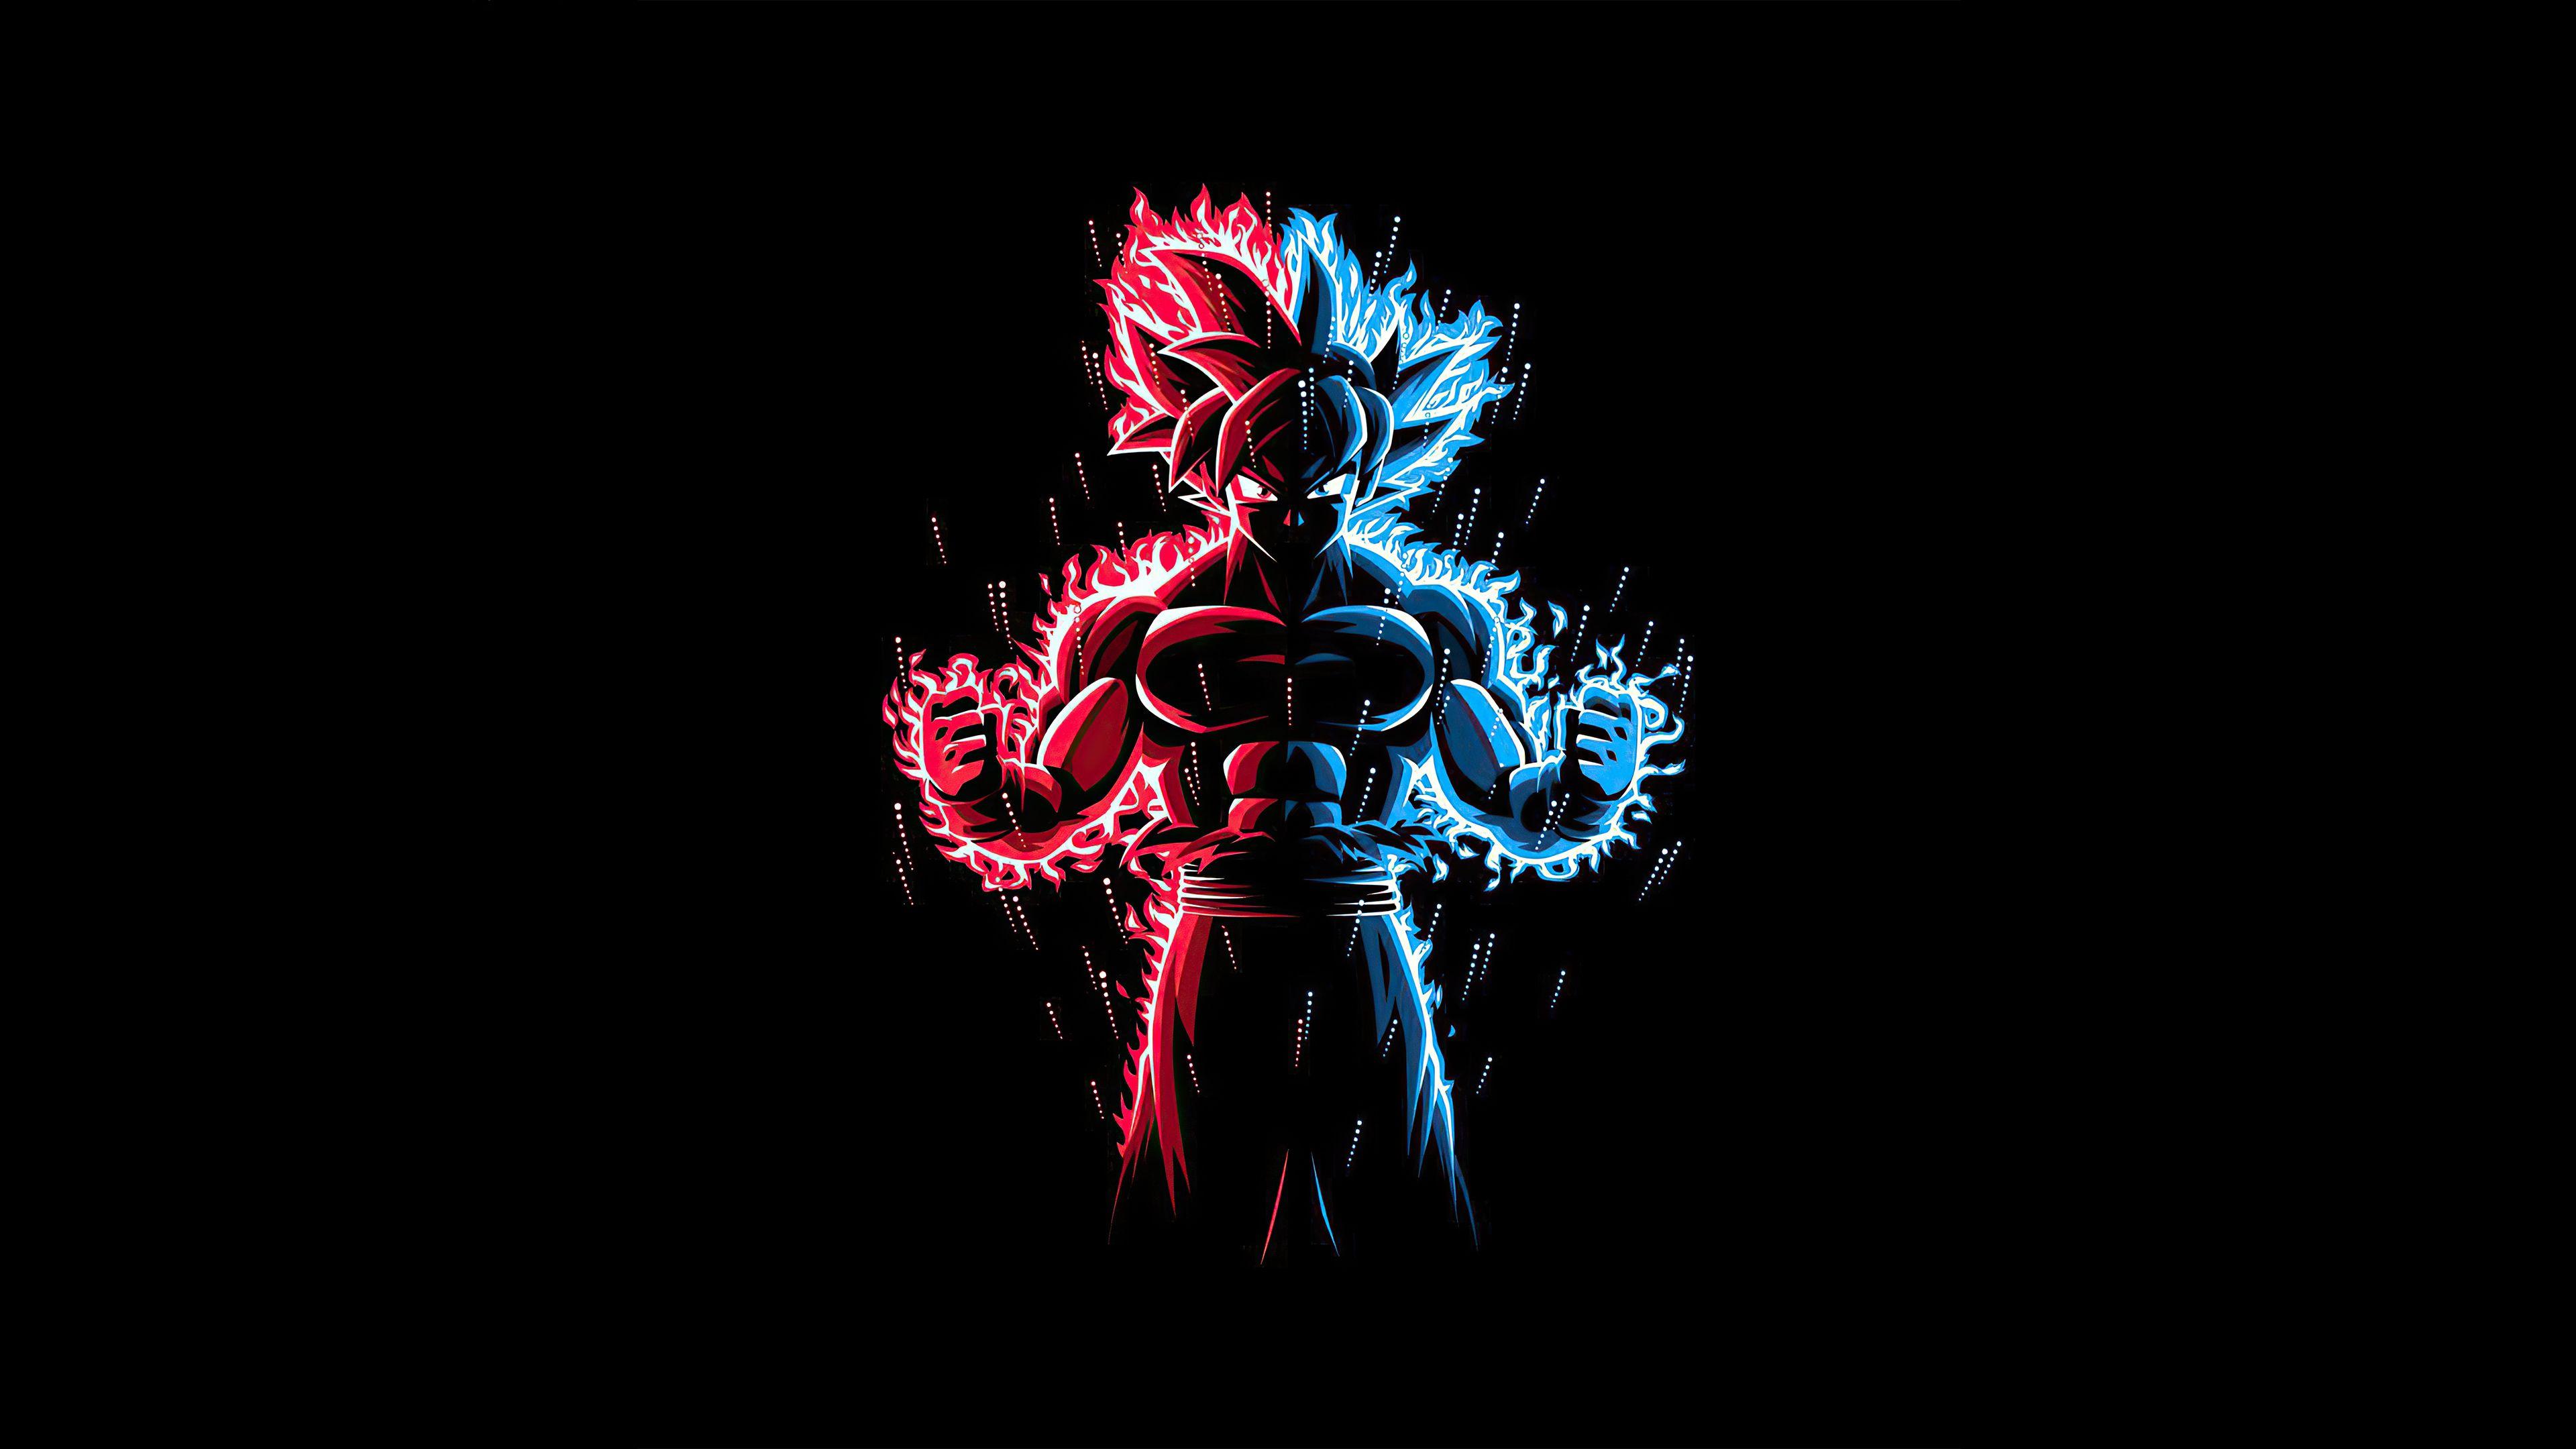 God Red Blue Goku Dragon Ball Z Dragon Ball Dragon Ball Z Red And Blue Anime wallpaper blue and red